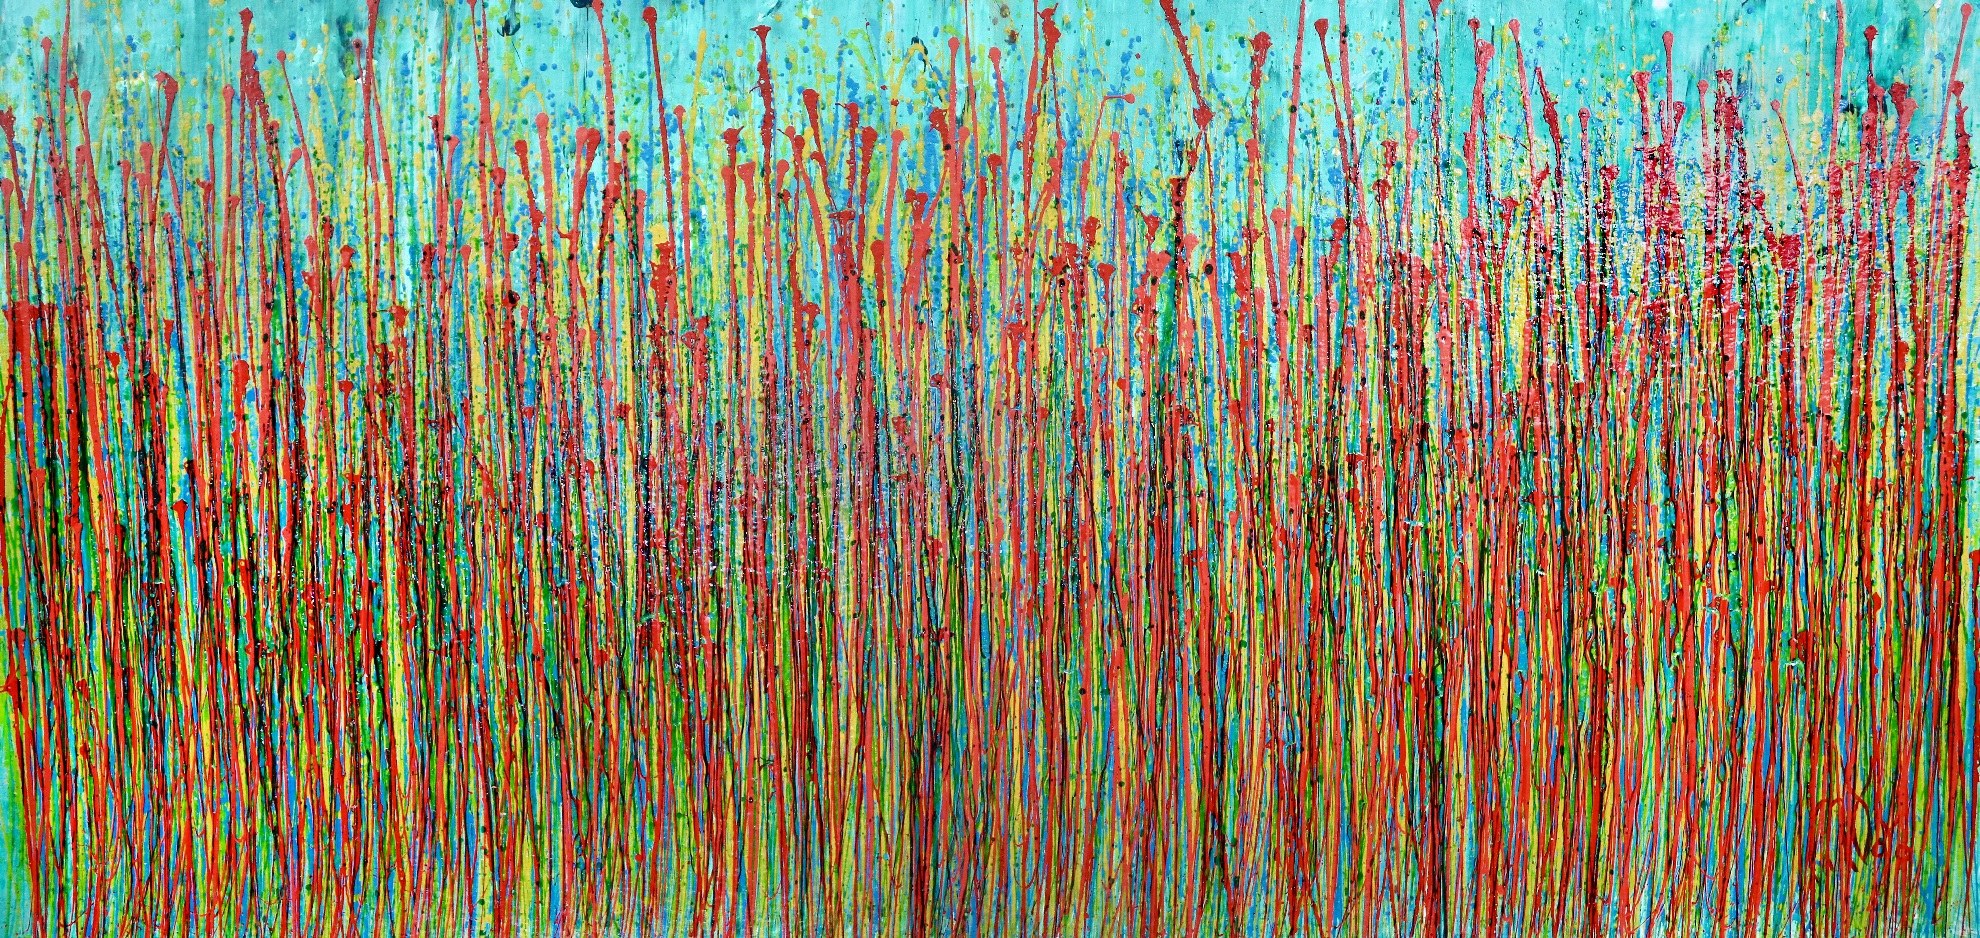 Superstition Garden (A Closer Look) by Nestor Toro